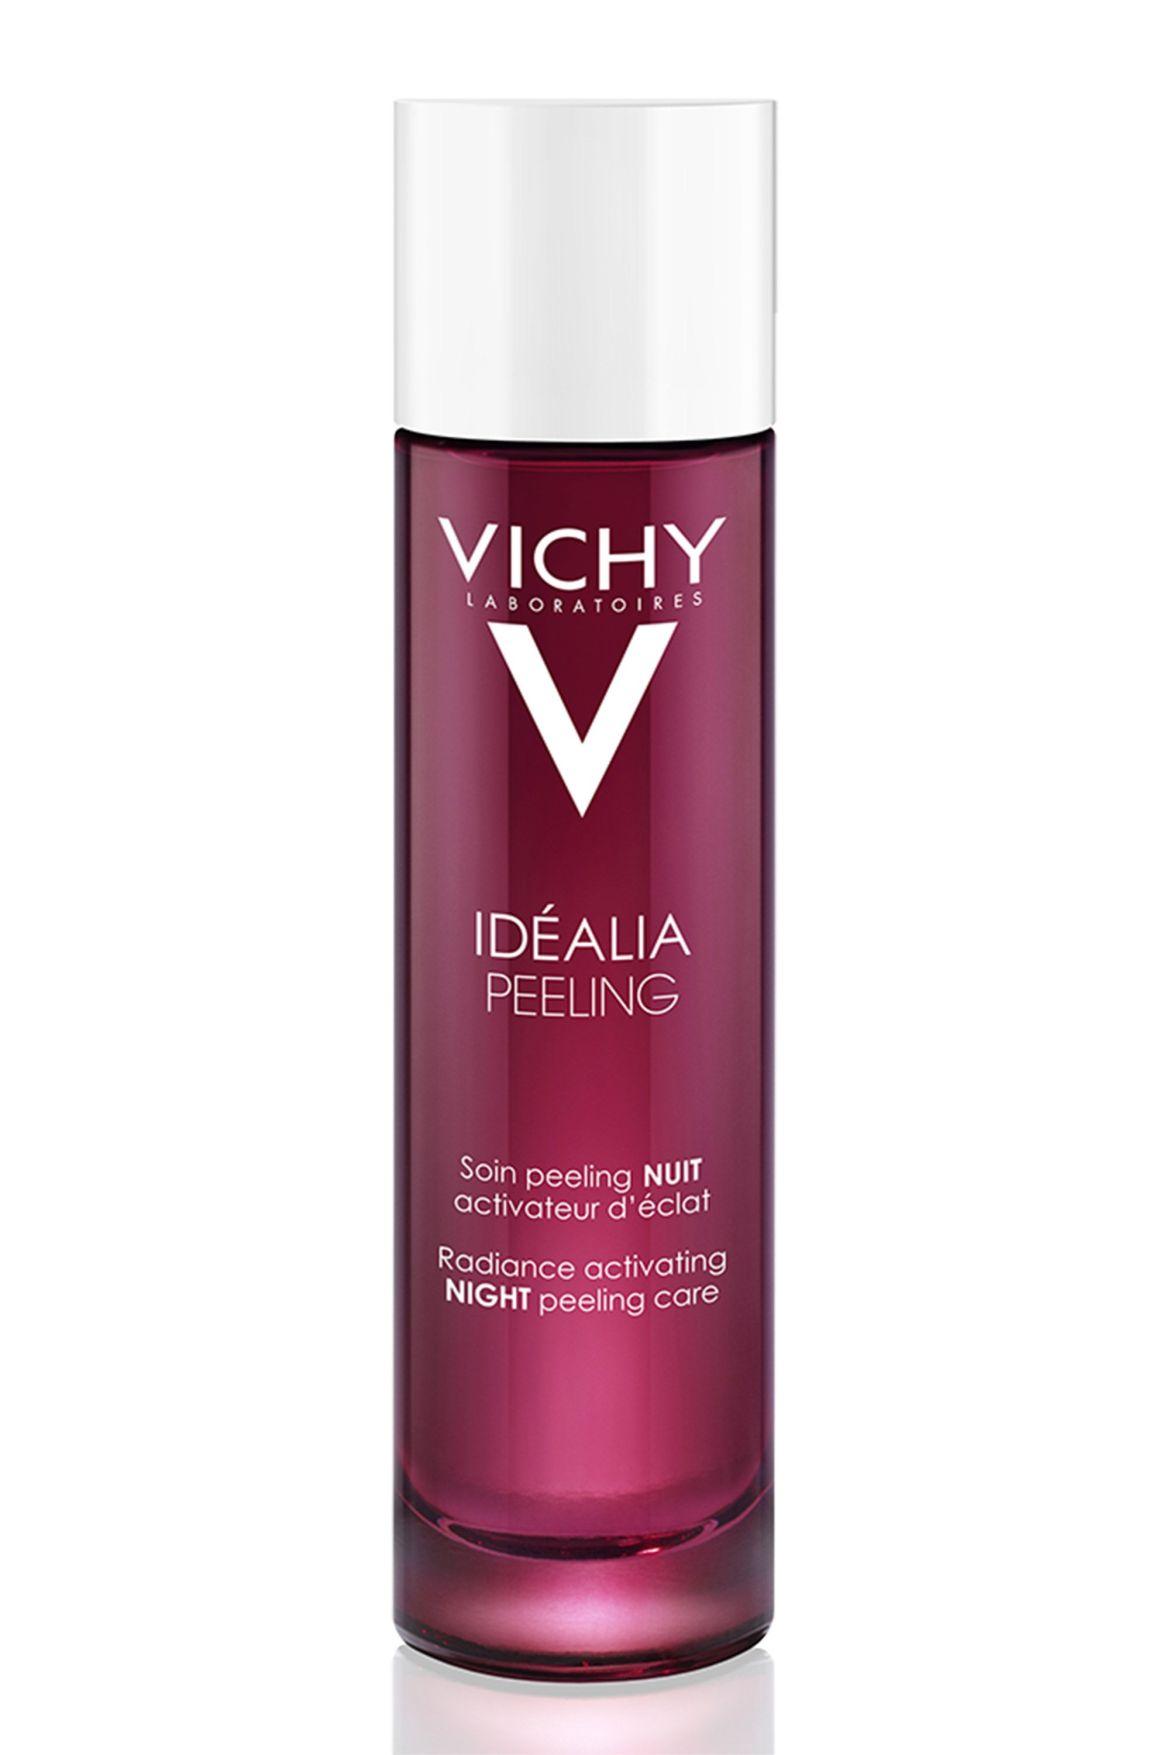 Vichy peeling care